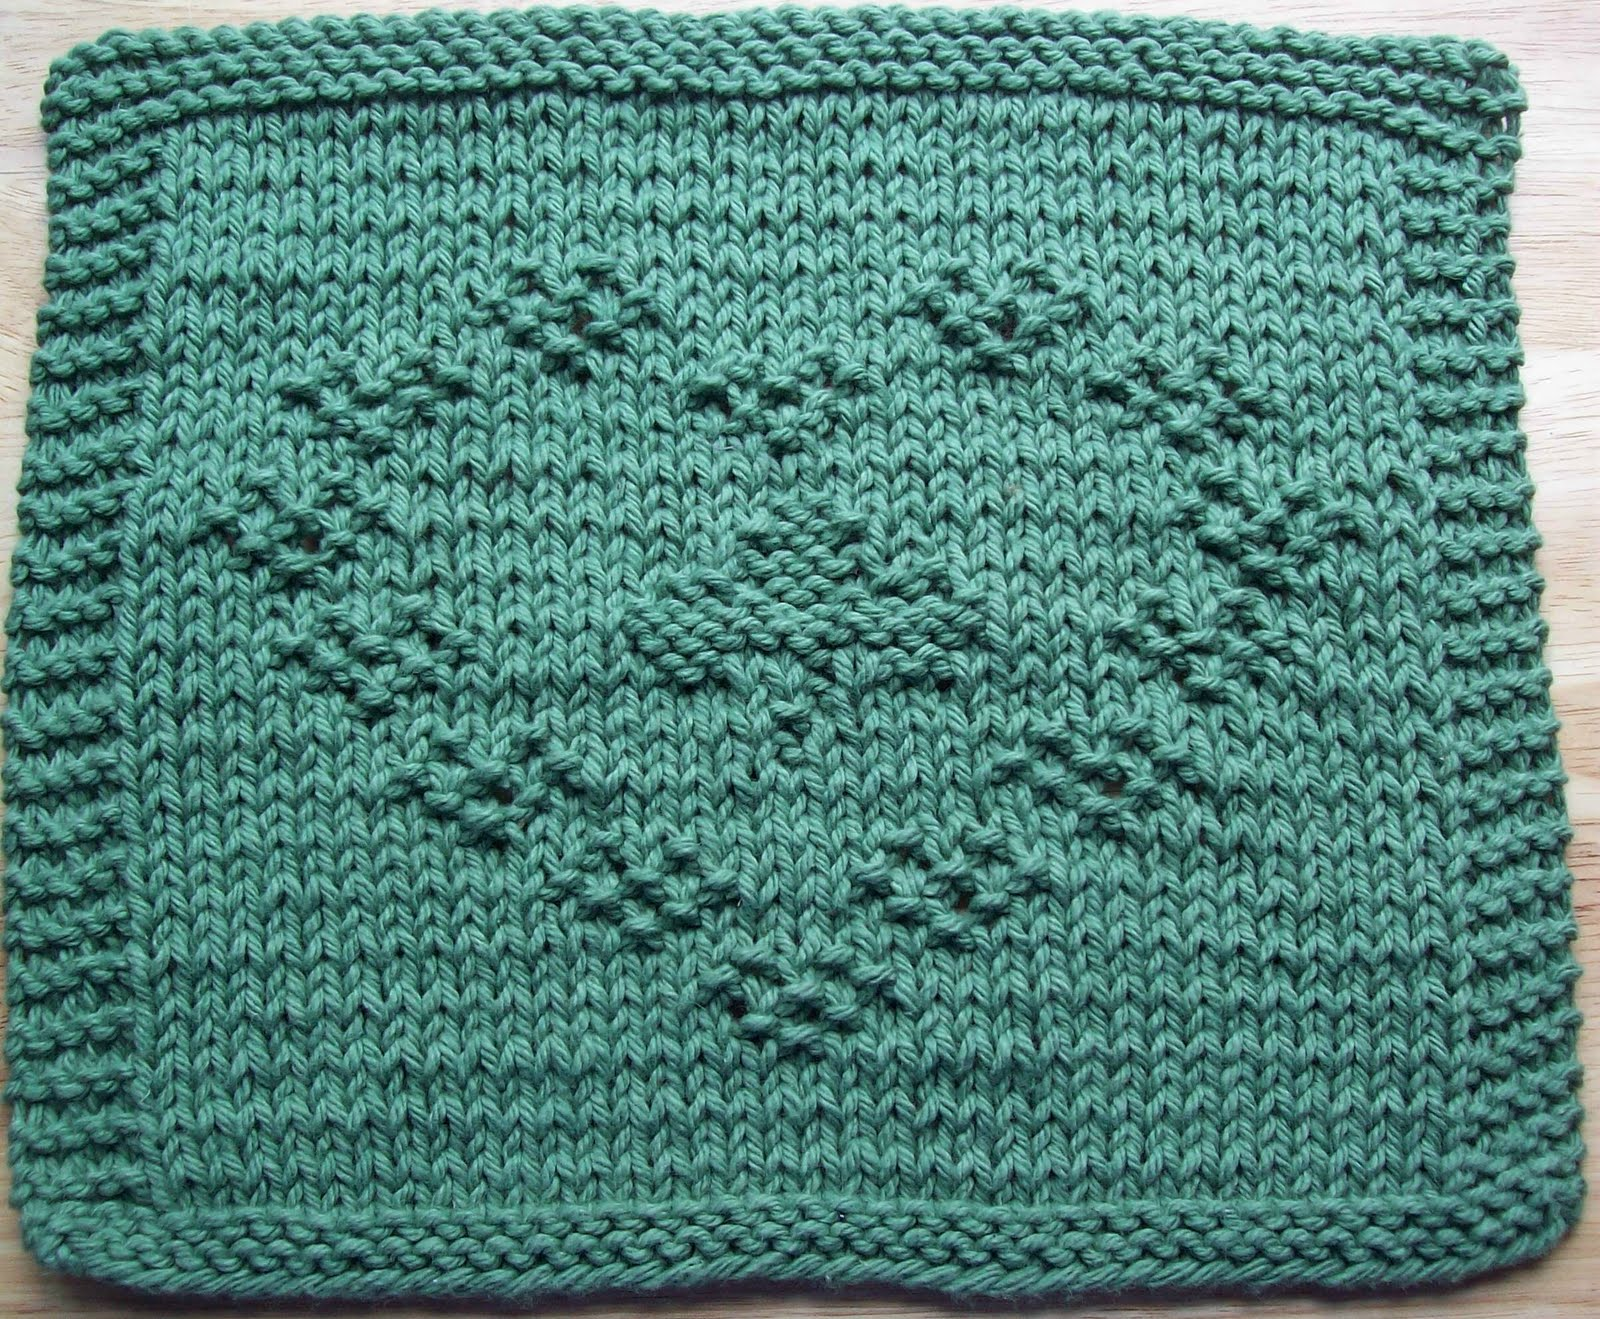 DigKnitty Designs: Shamrock Heart Too Knit Dishcloth Pattern